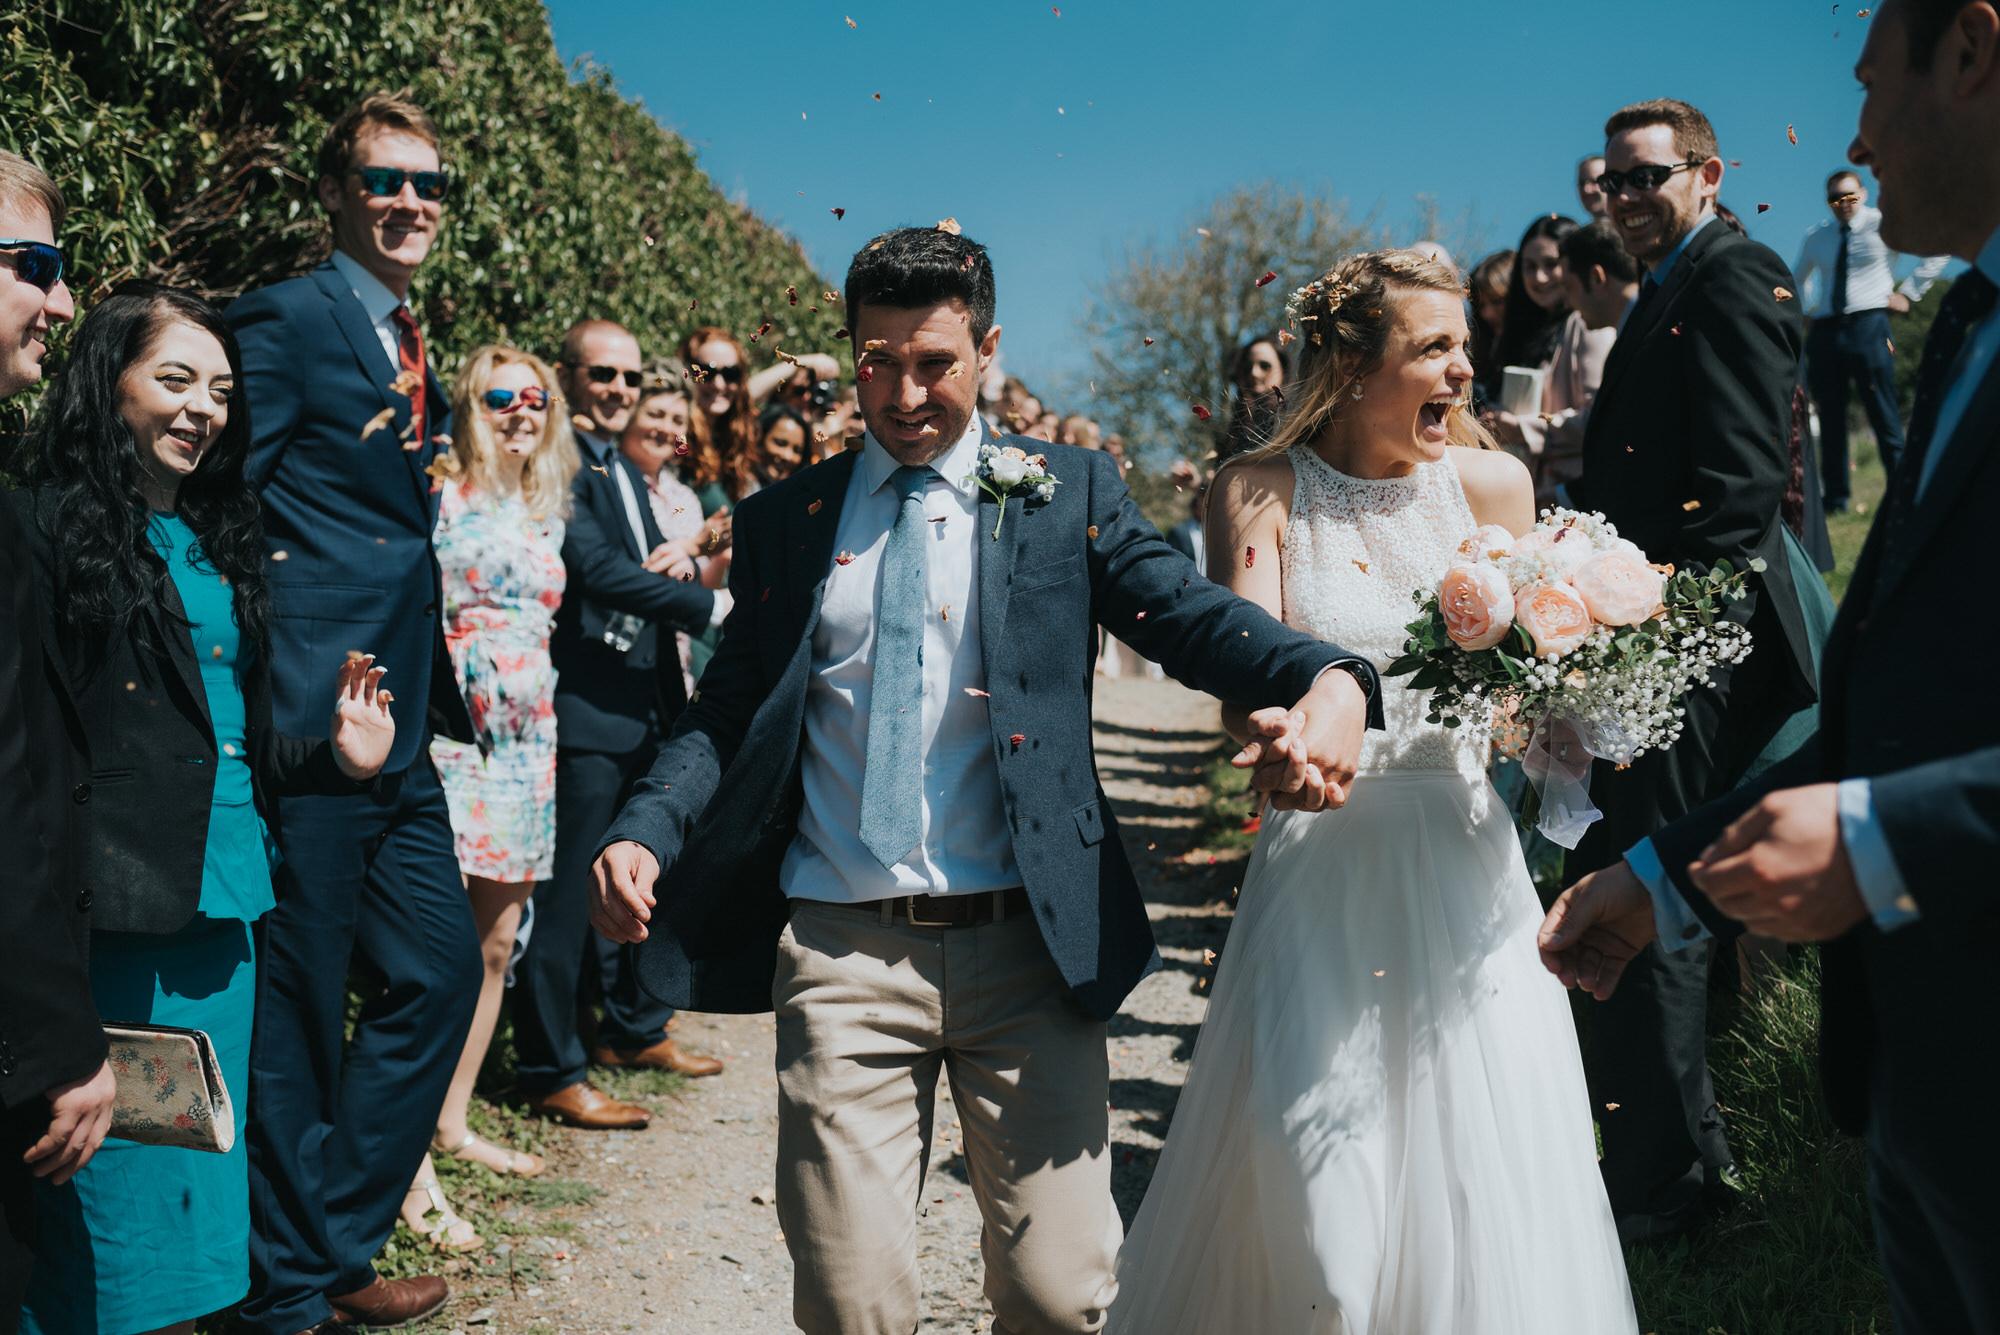 Roscarrock farm wedding photography 12-2